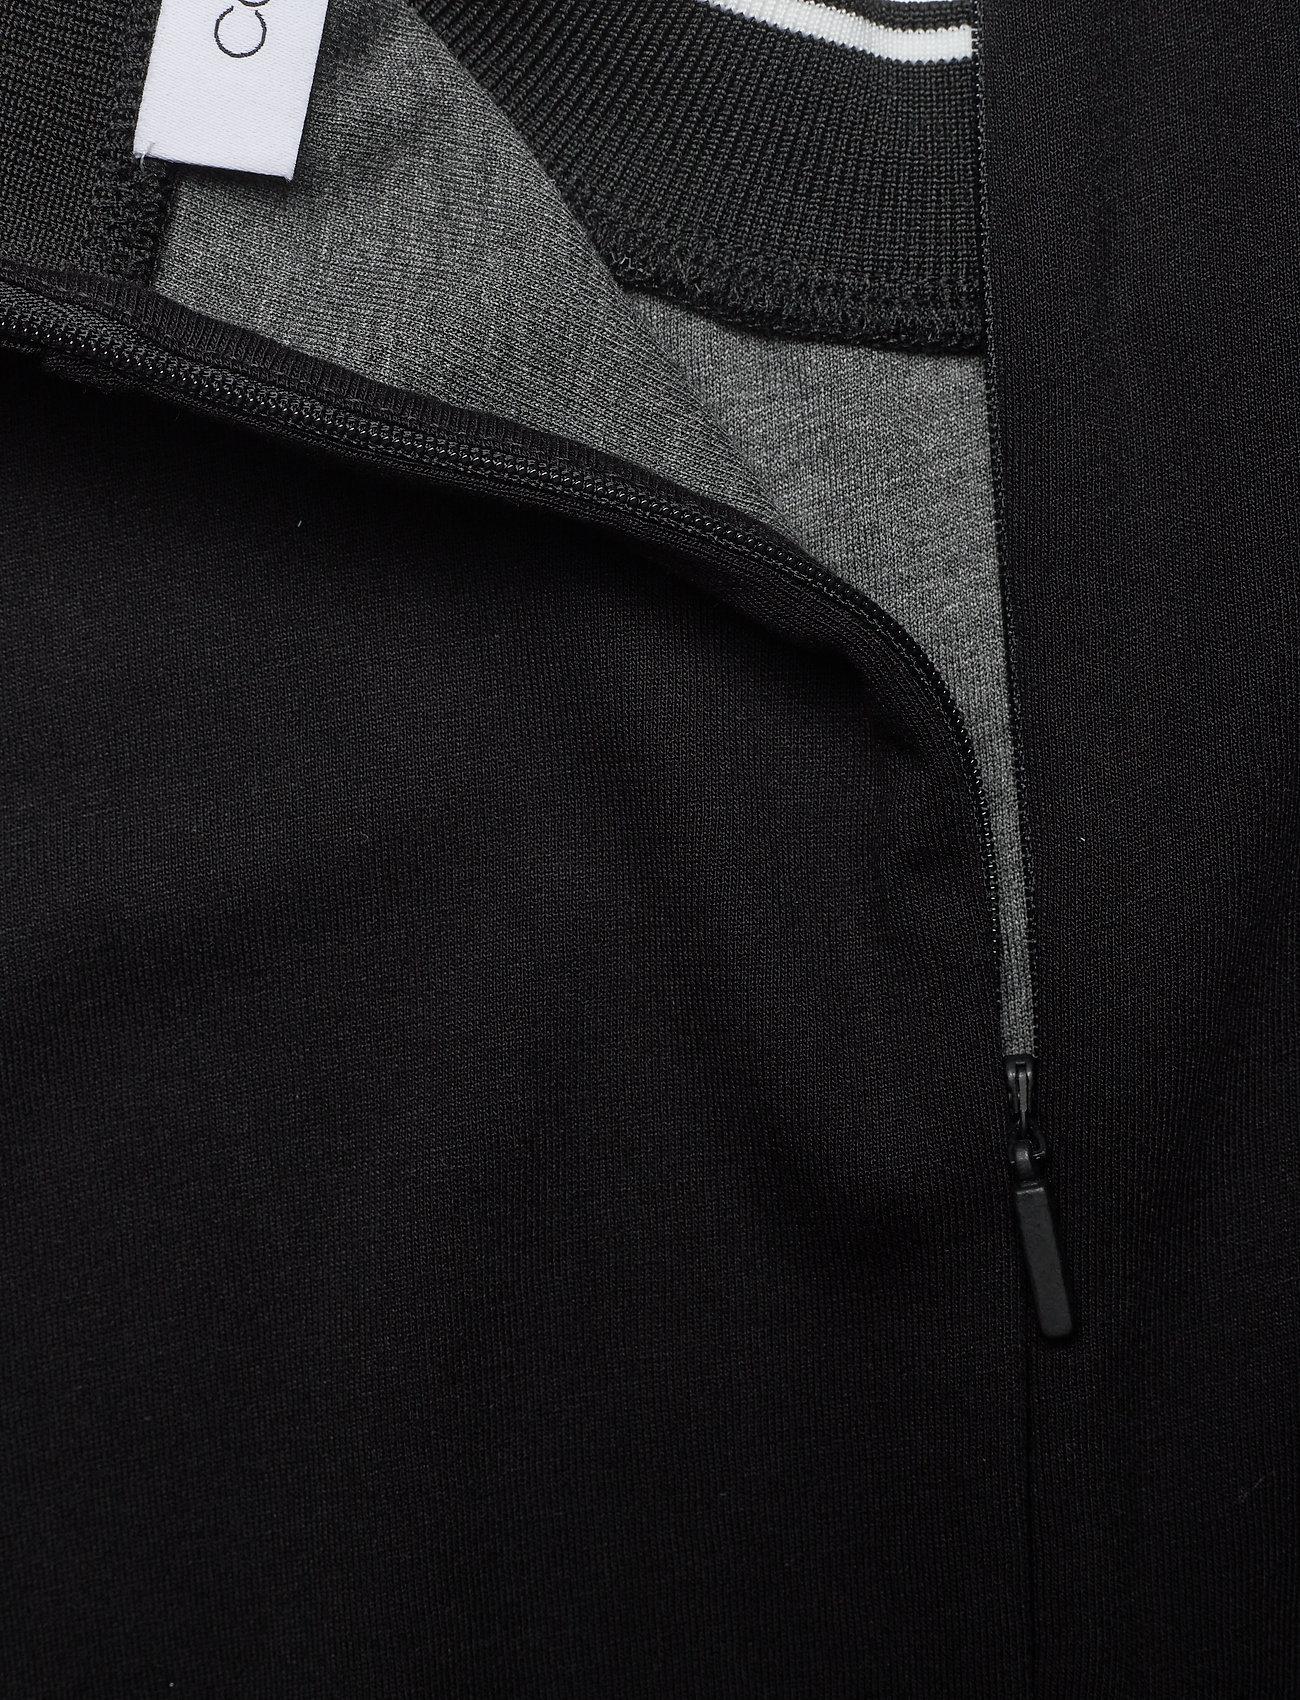 3/4 Sleeve Jersey Dress (Calvin Black) (1125 kr) - Calvin Klein